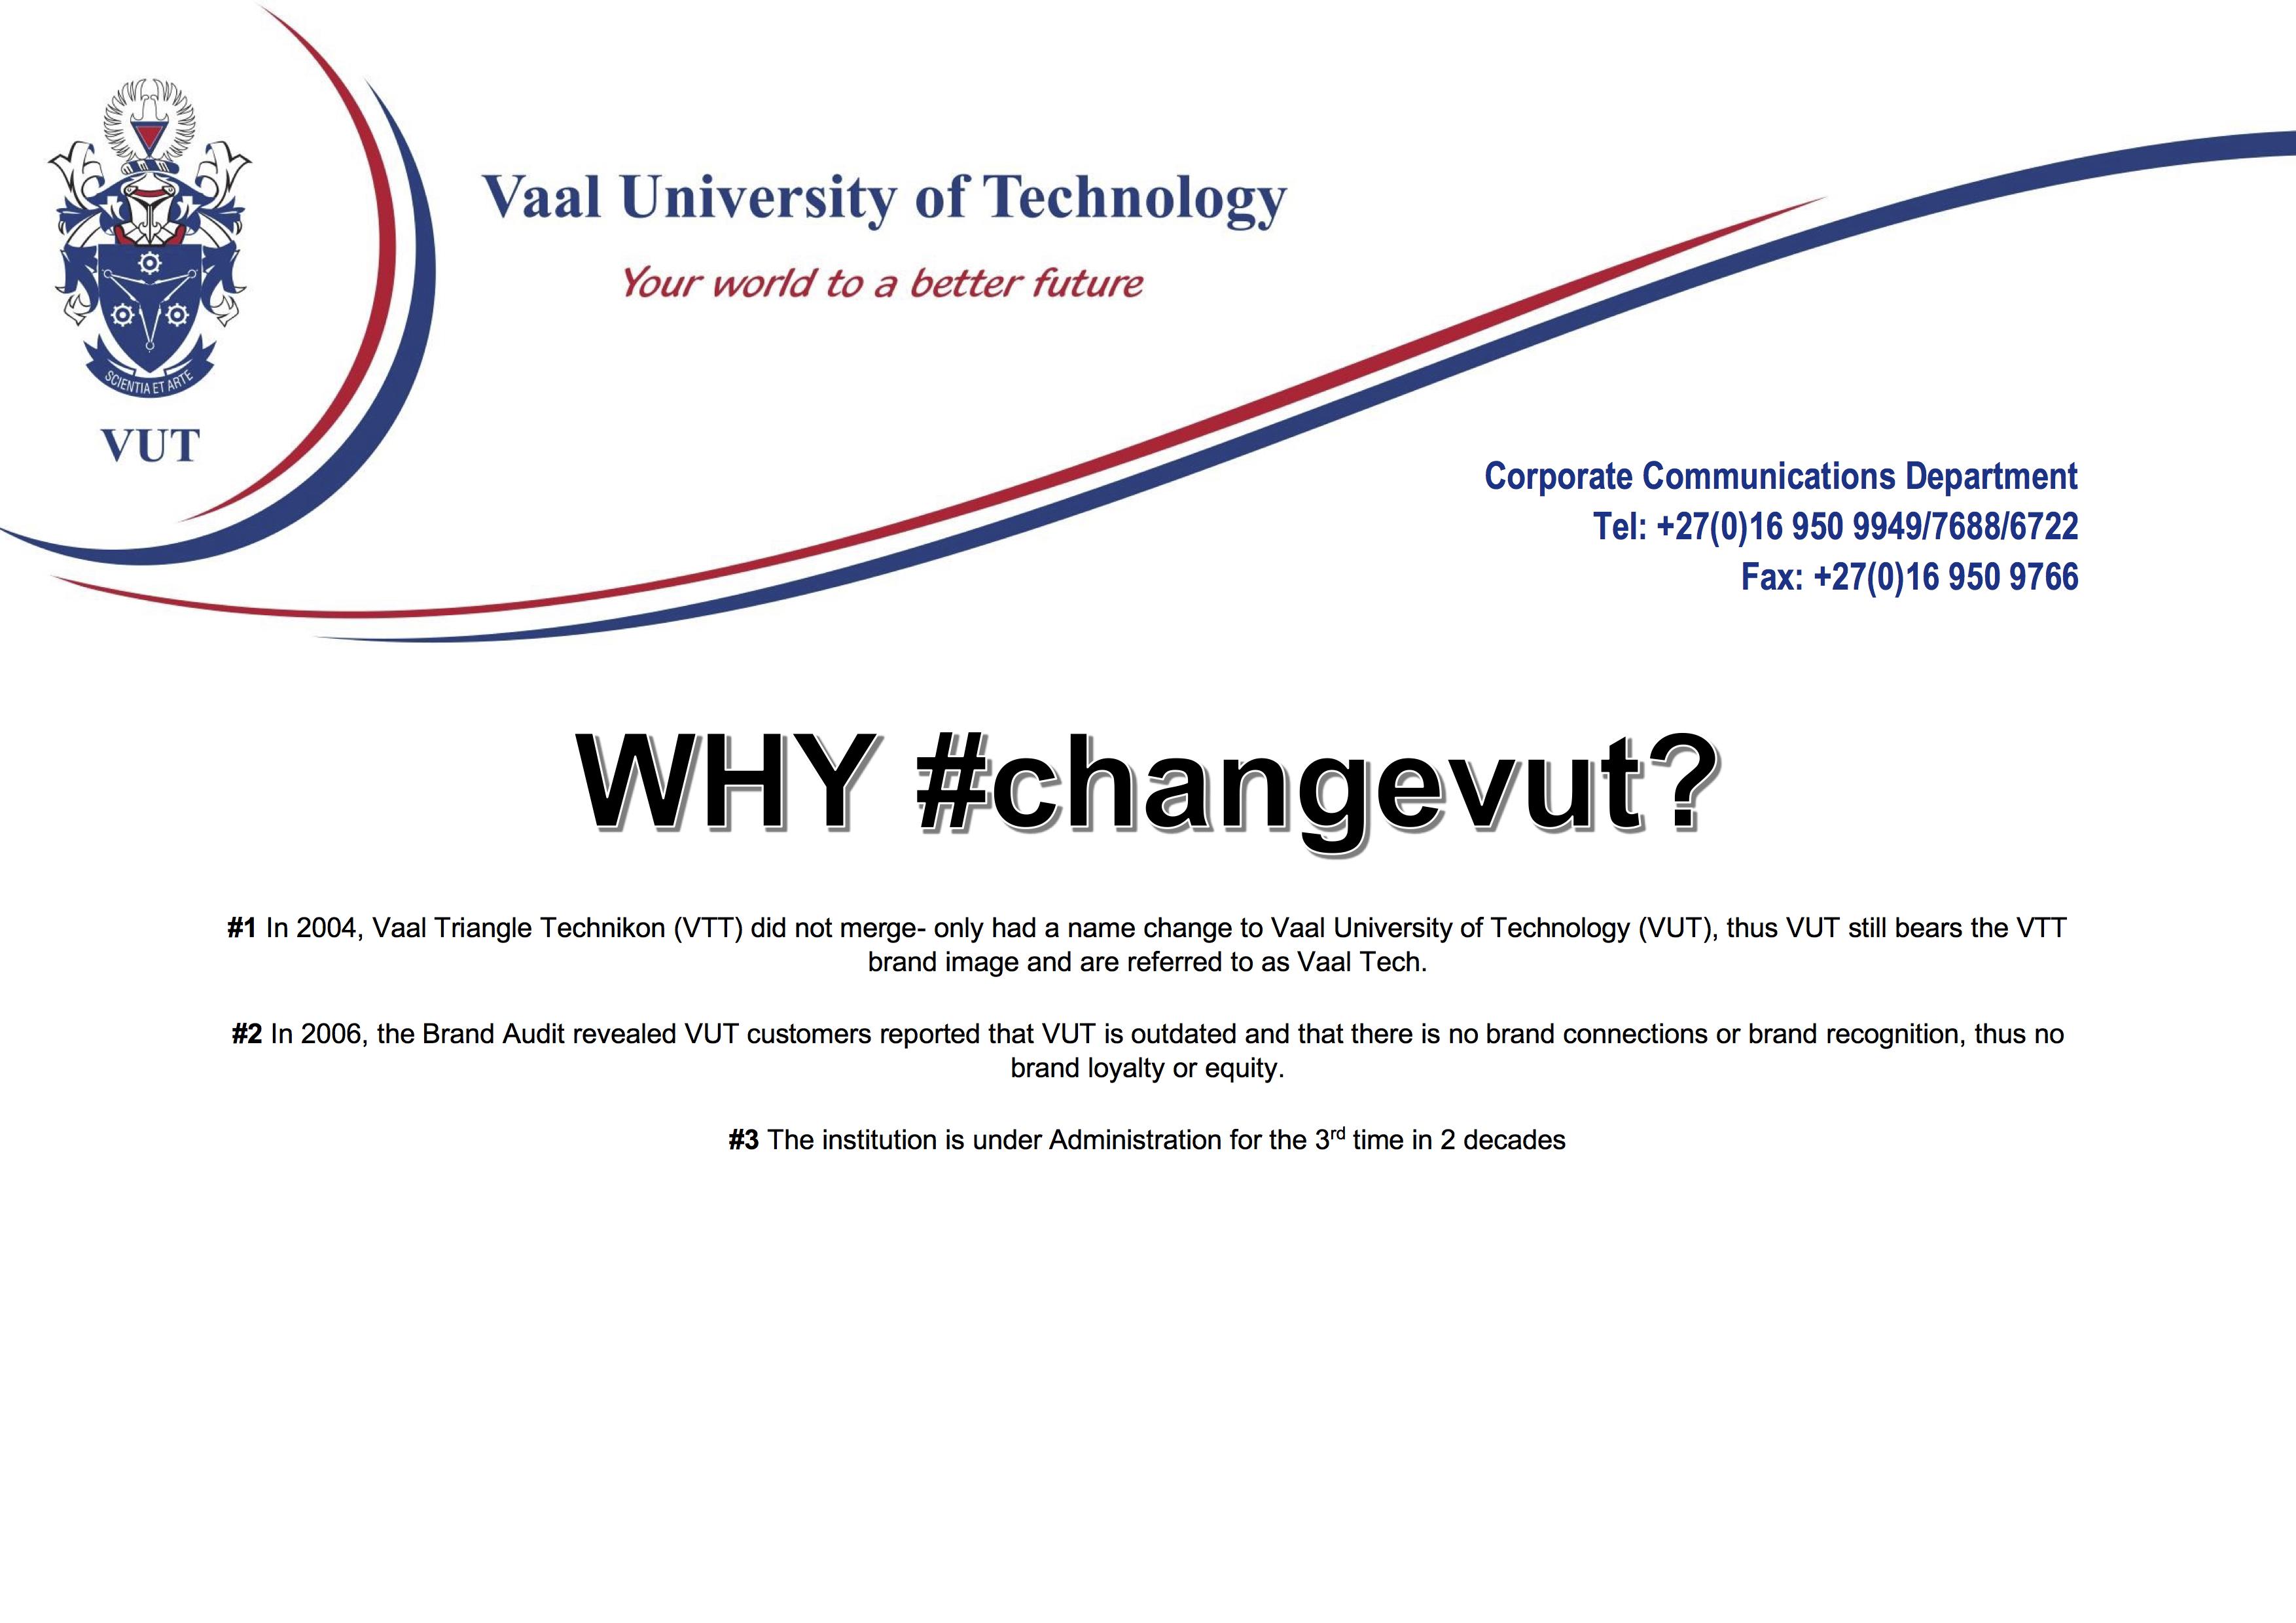 WHY #changevut?